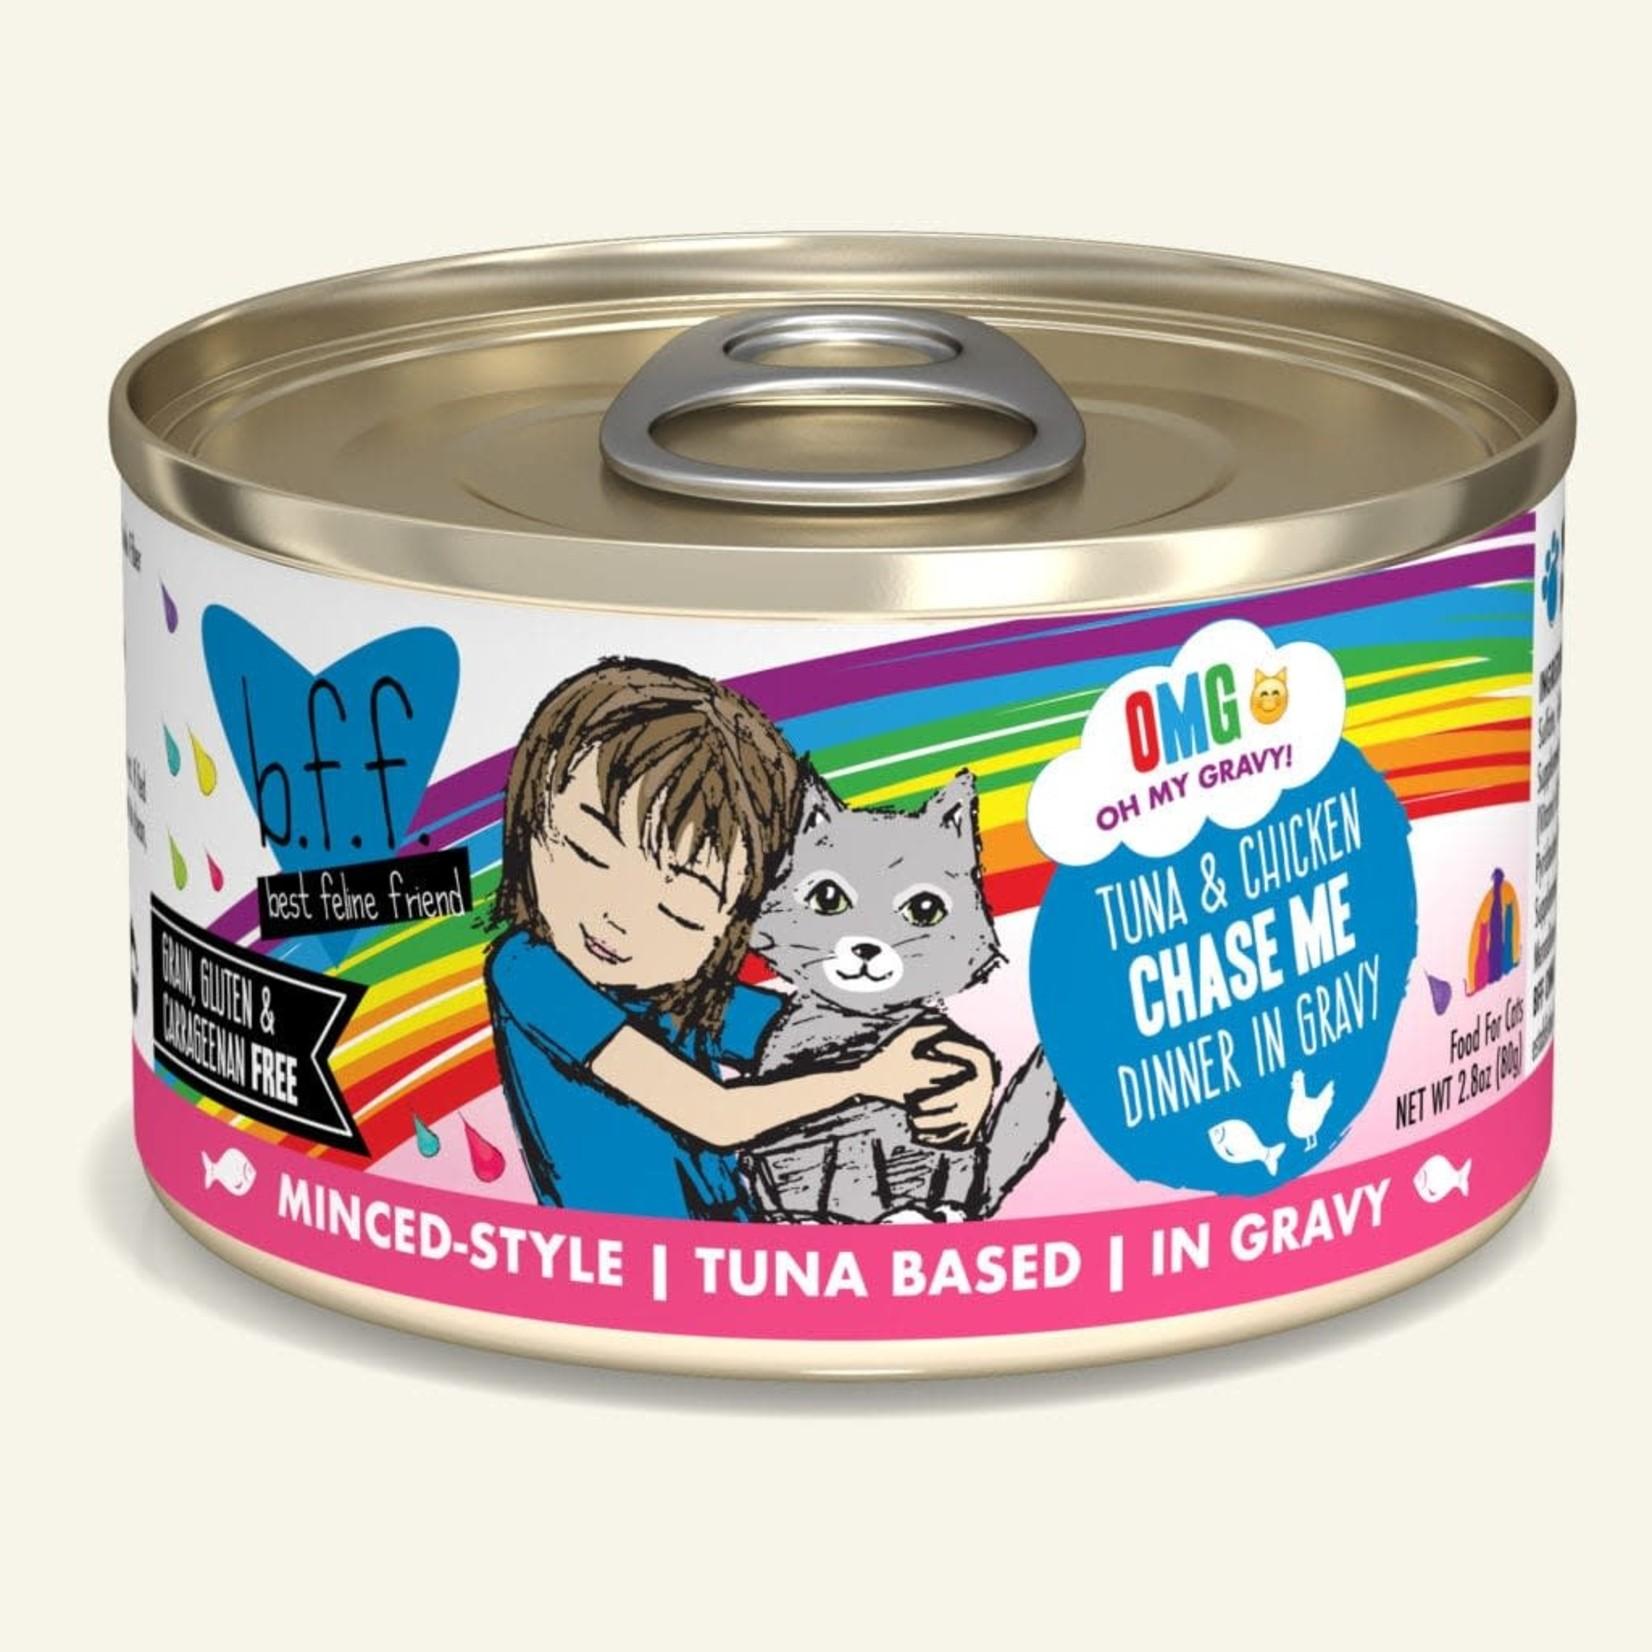 Weruva Inc. BFF OMG Cat Tuna & Chicken Chase Me 2.8 OZ